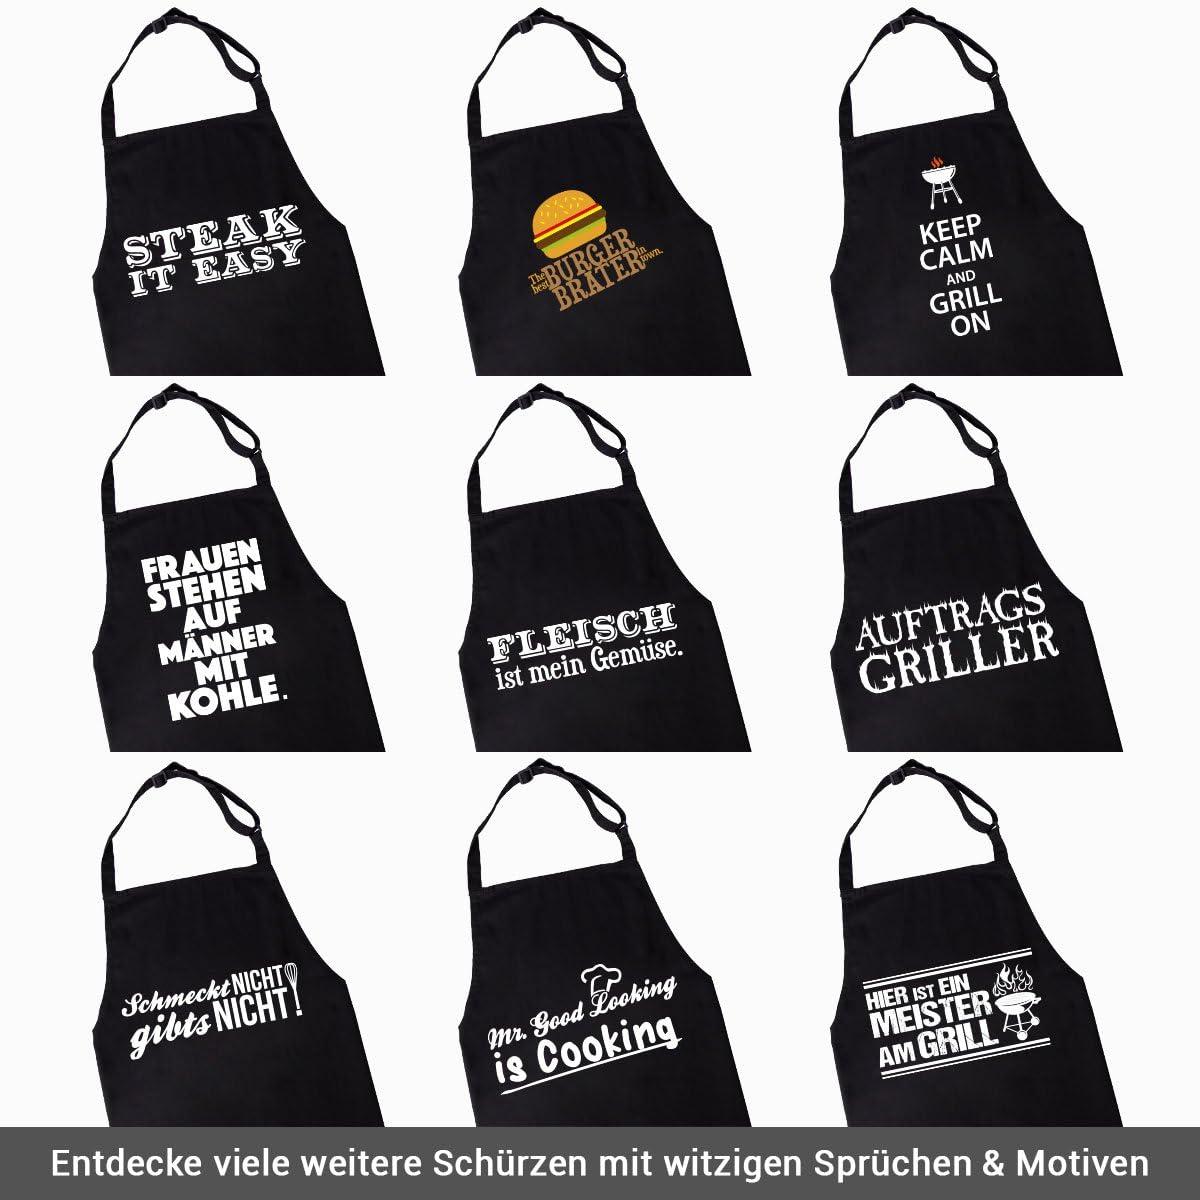 WANDKINGS Sch/ürze Mrs Good Looking is Cooking Kochsch/ürze K/üchensch/ürze Grillsch/ürze Latzsch/ürze mit Verstellbarem Nackenband